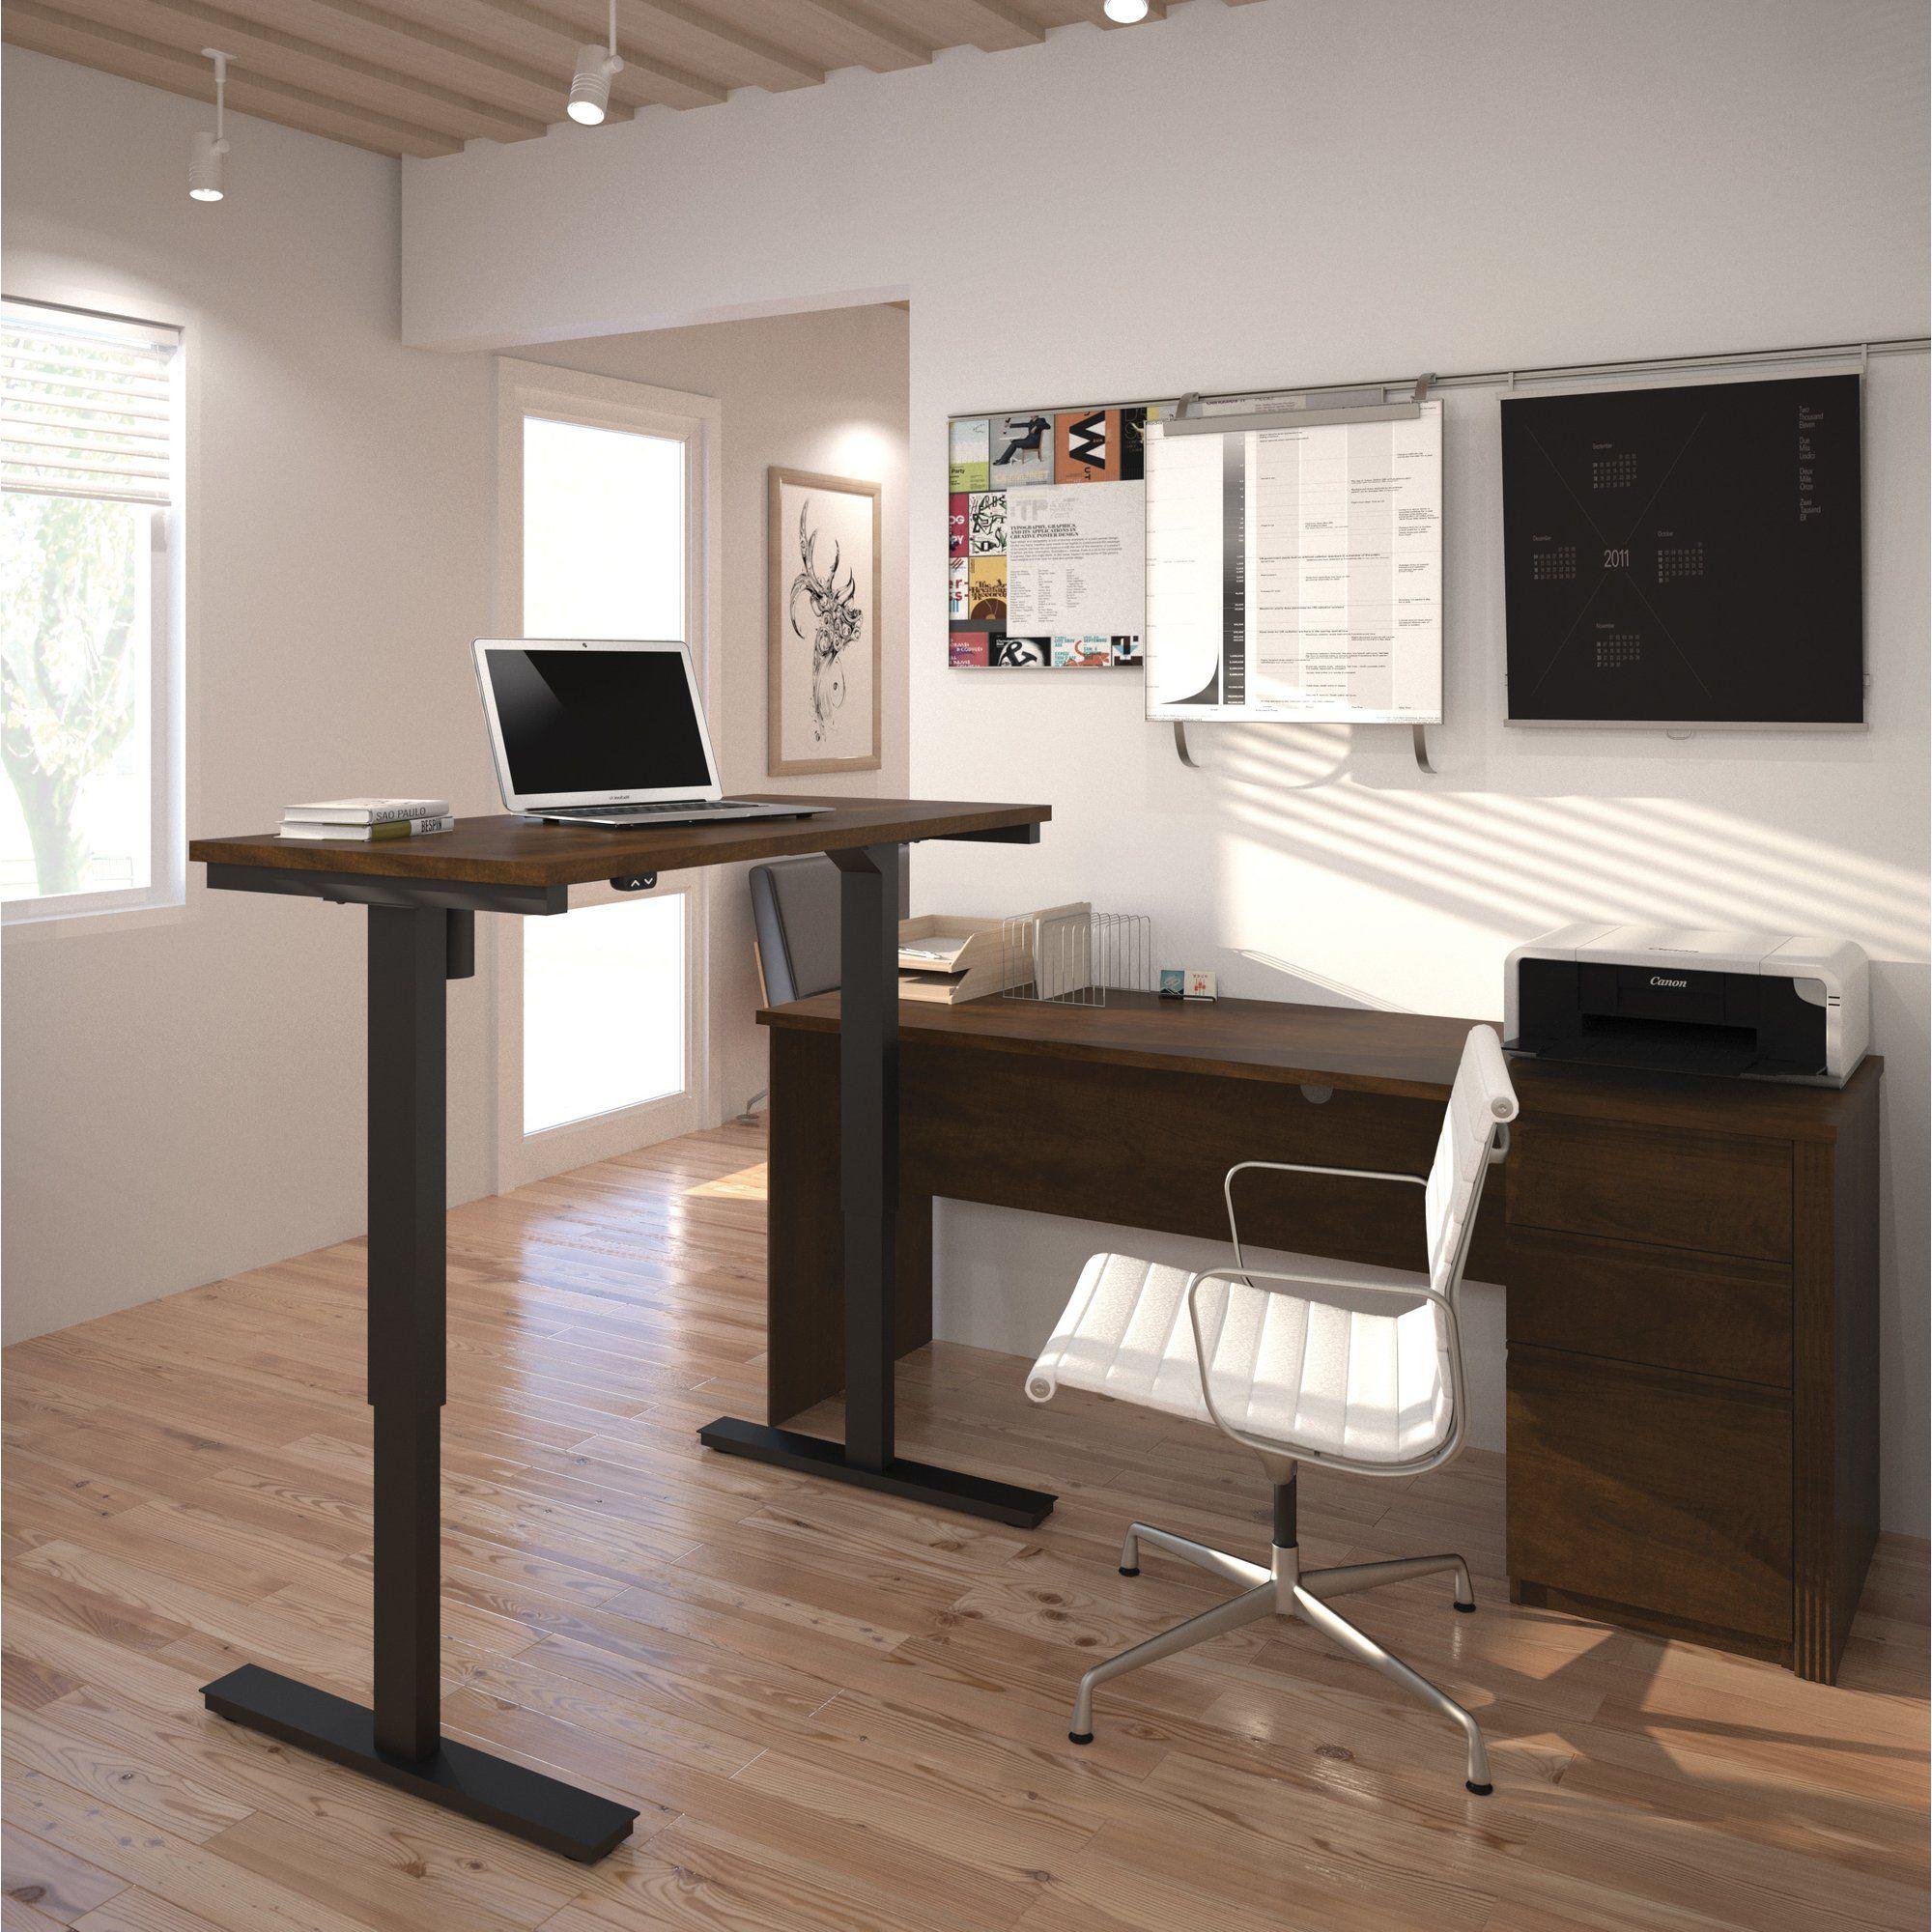 bormann l shape standing desk with height adjustable table desks